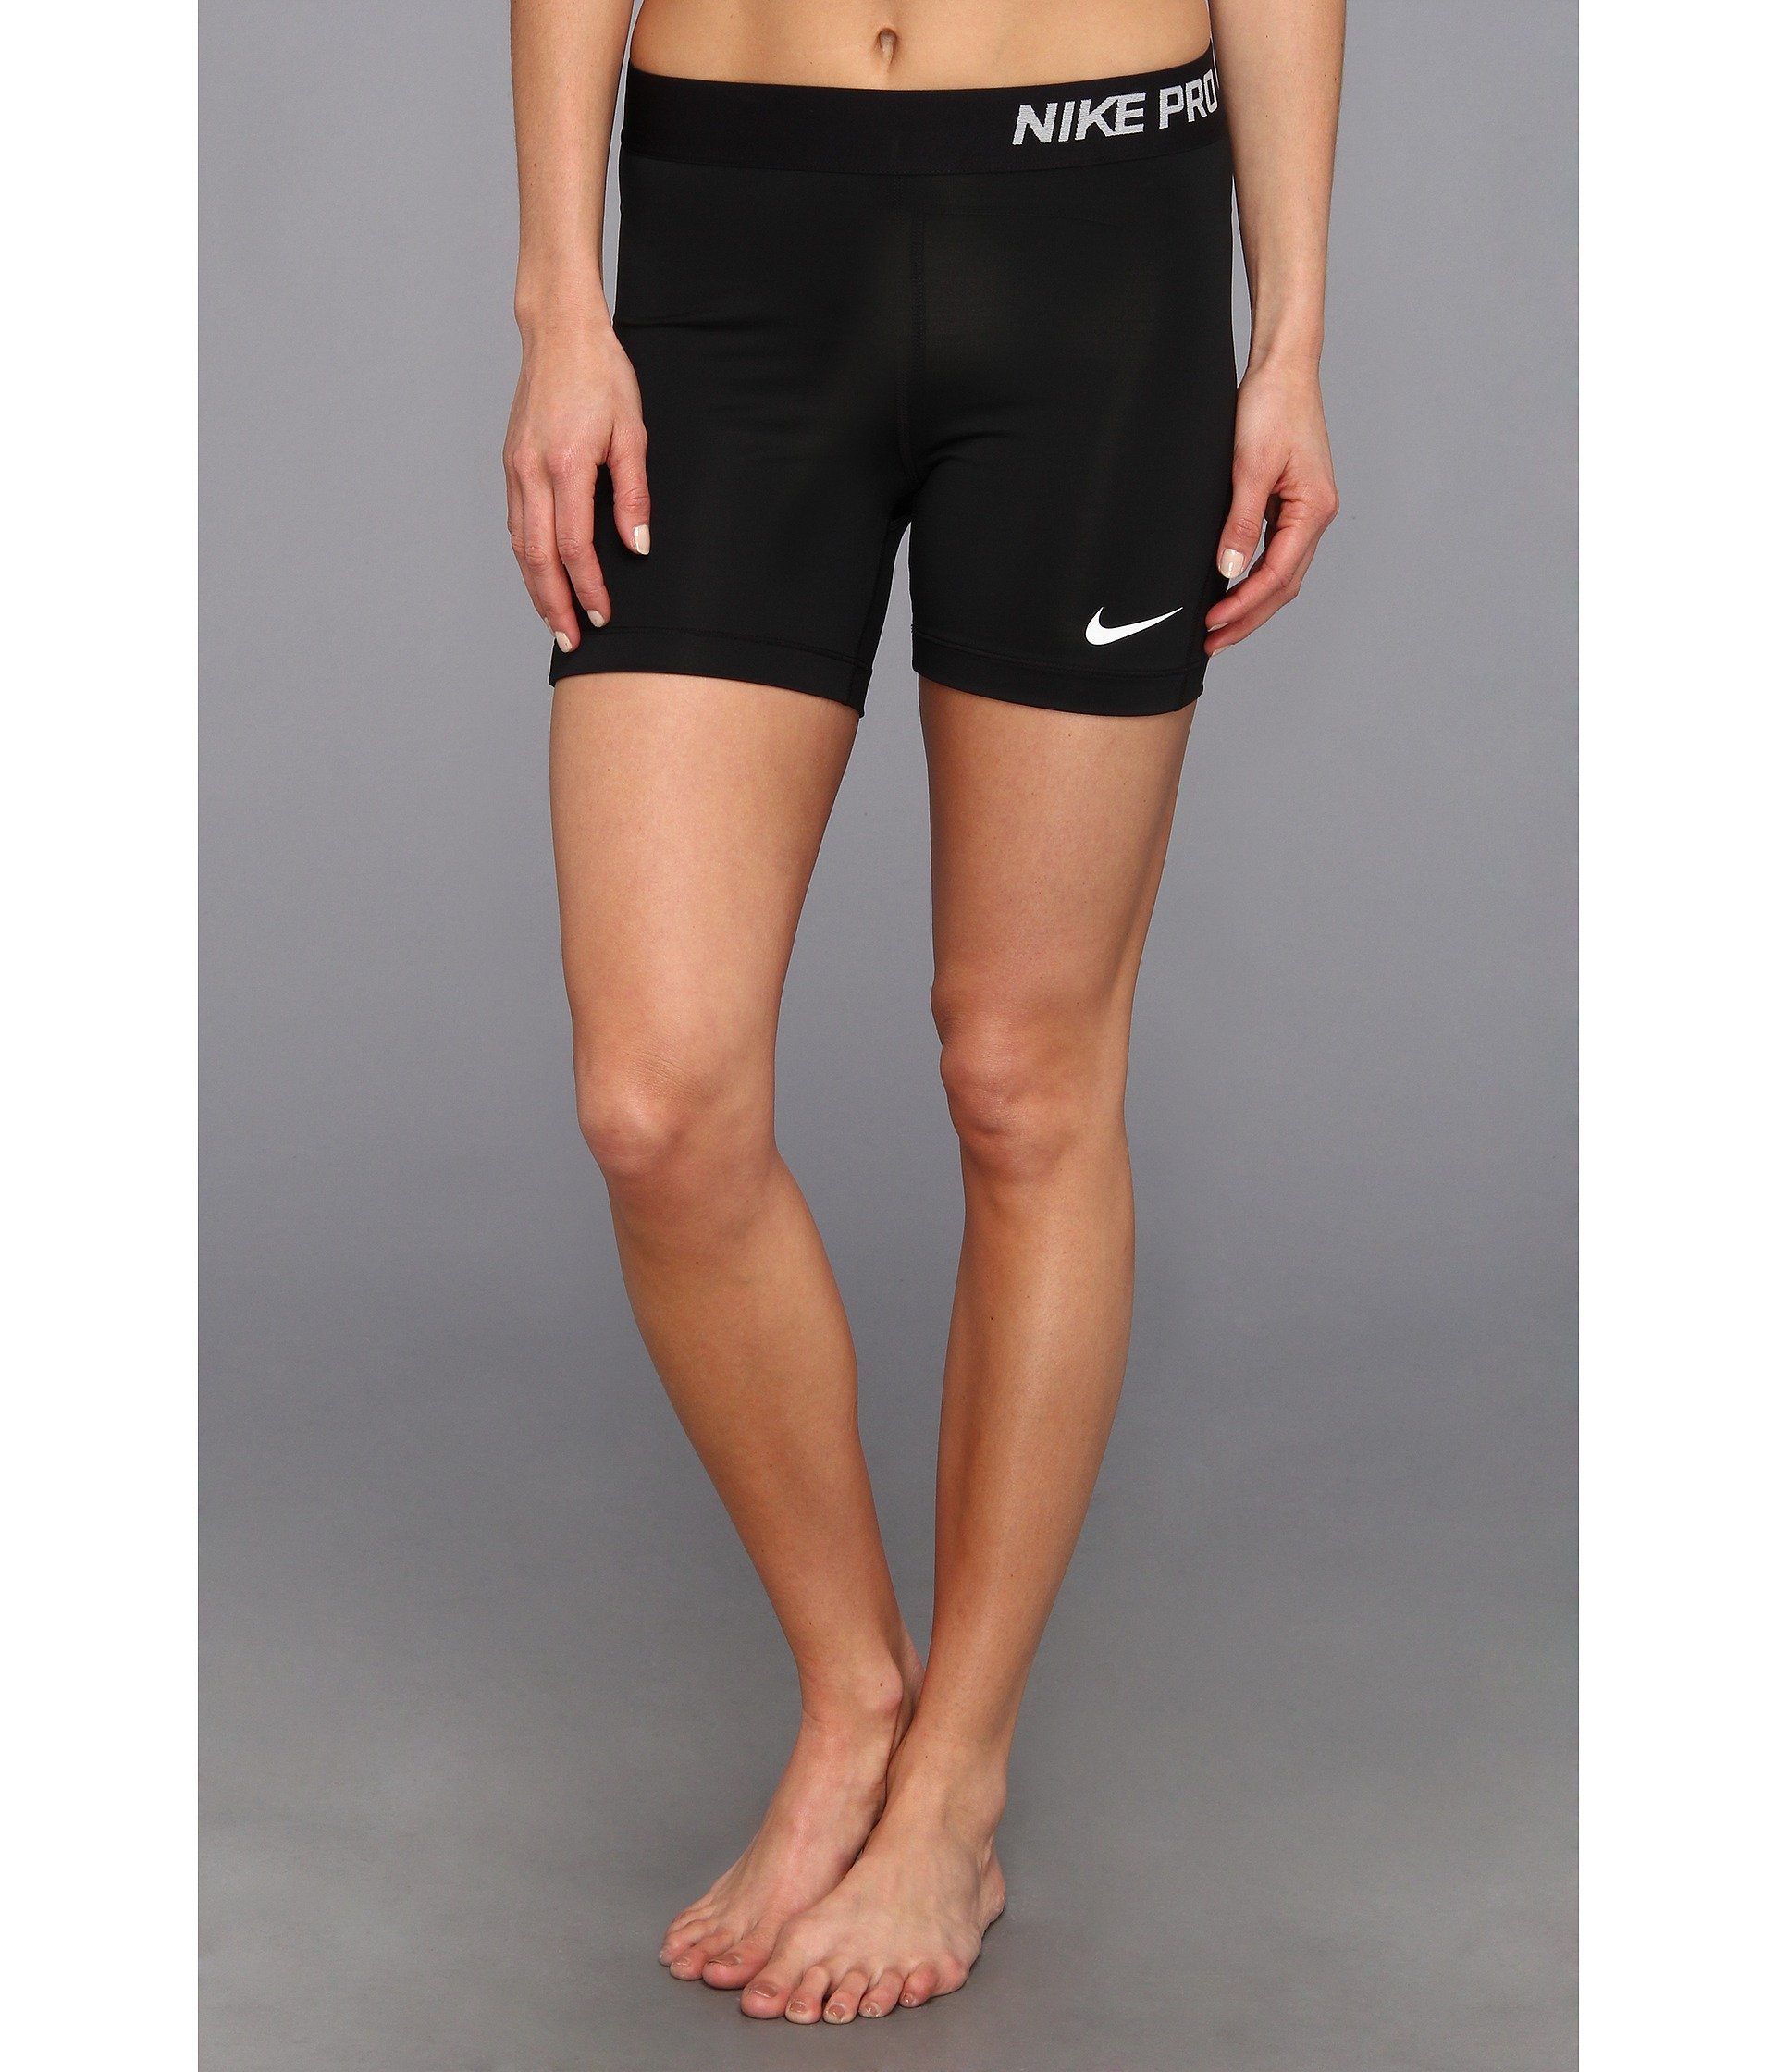 Nike Pro 5'' Compression Shorts,Black/White,Medium